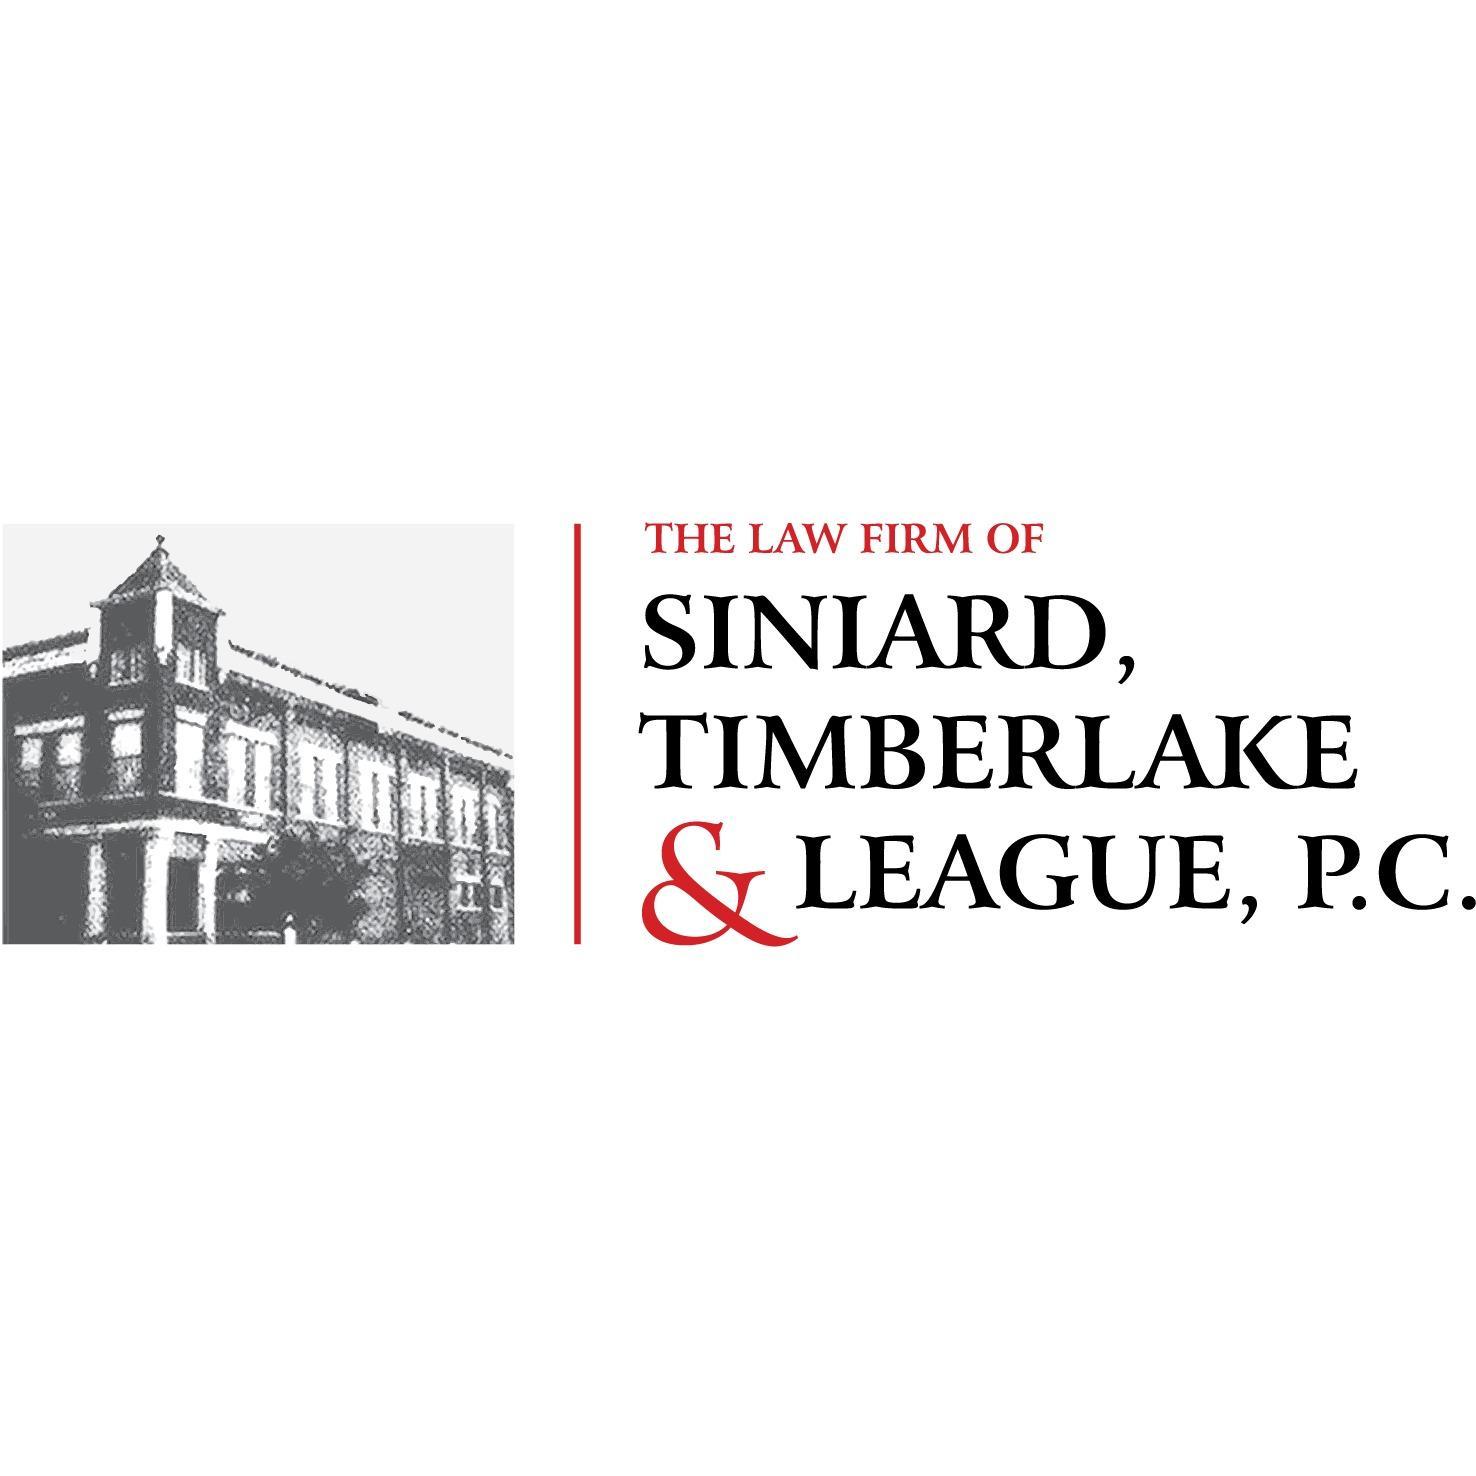 Siniard, Timberlake & League, P.C.